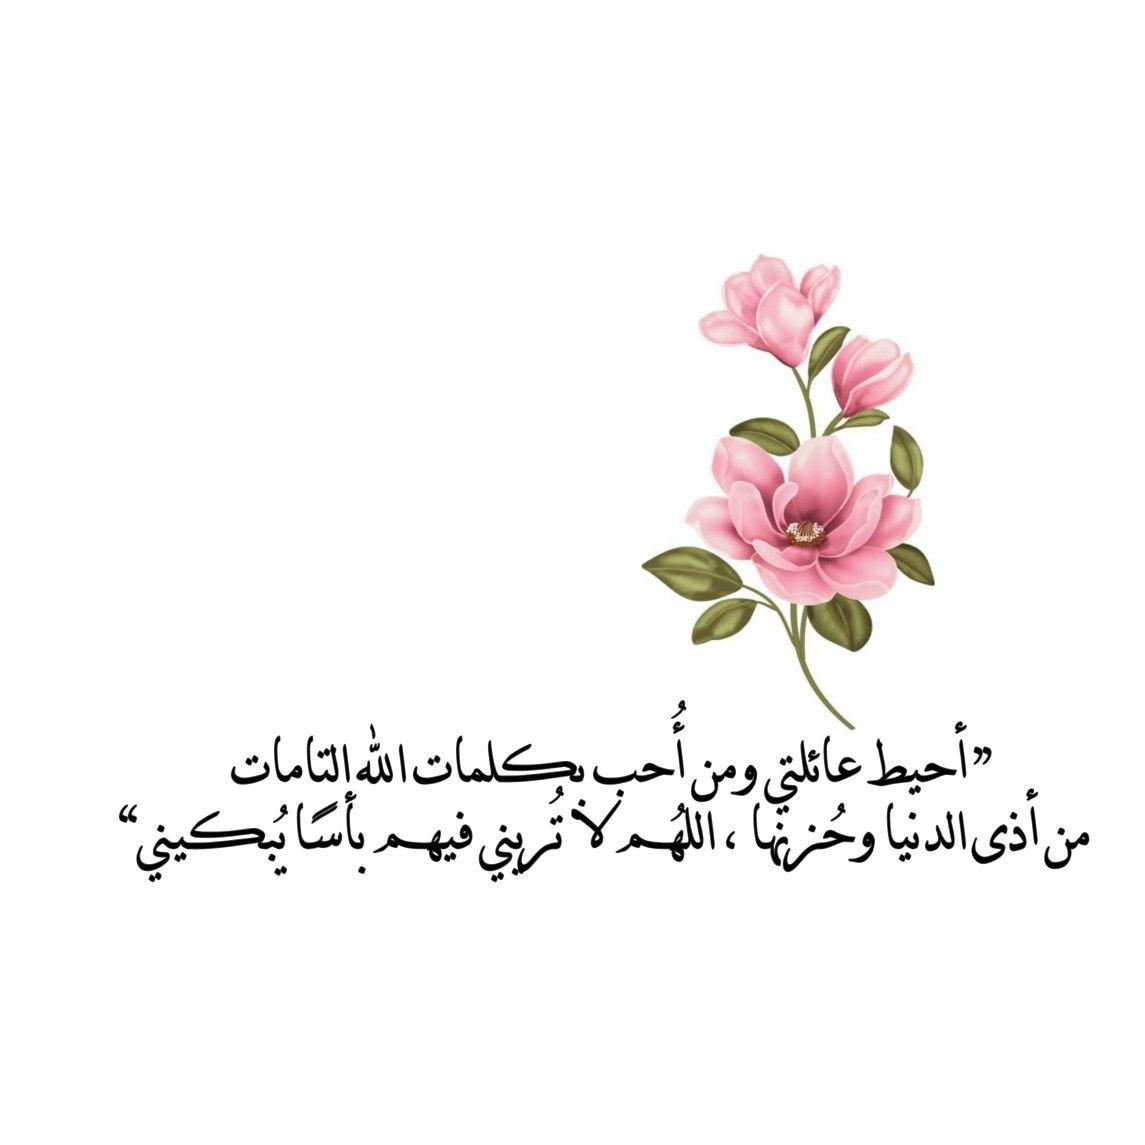 Pin By Syeℓma ۦ On تصاميمي بدون حقوق Quran Book Home Decor Decals Arabic Words